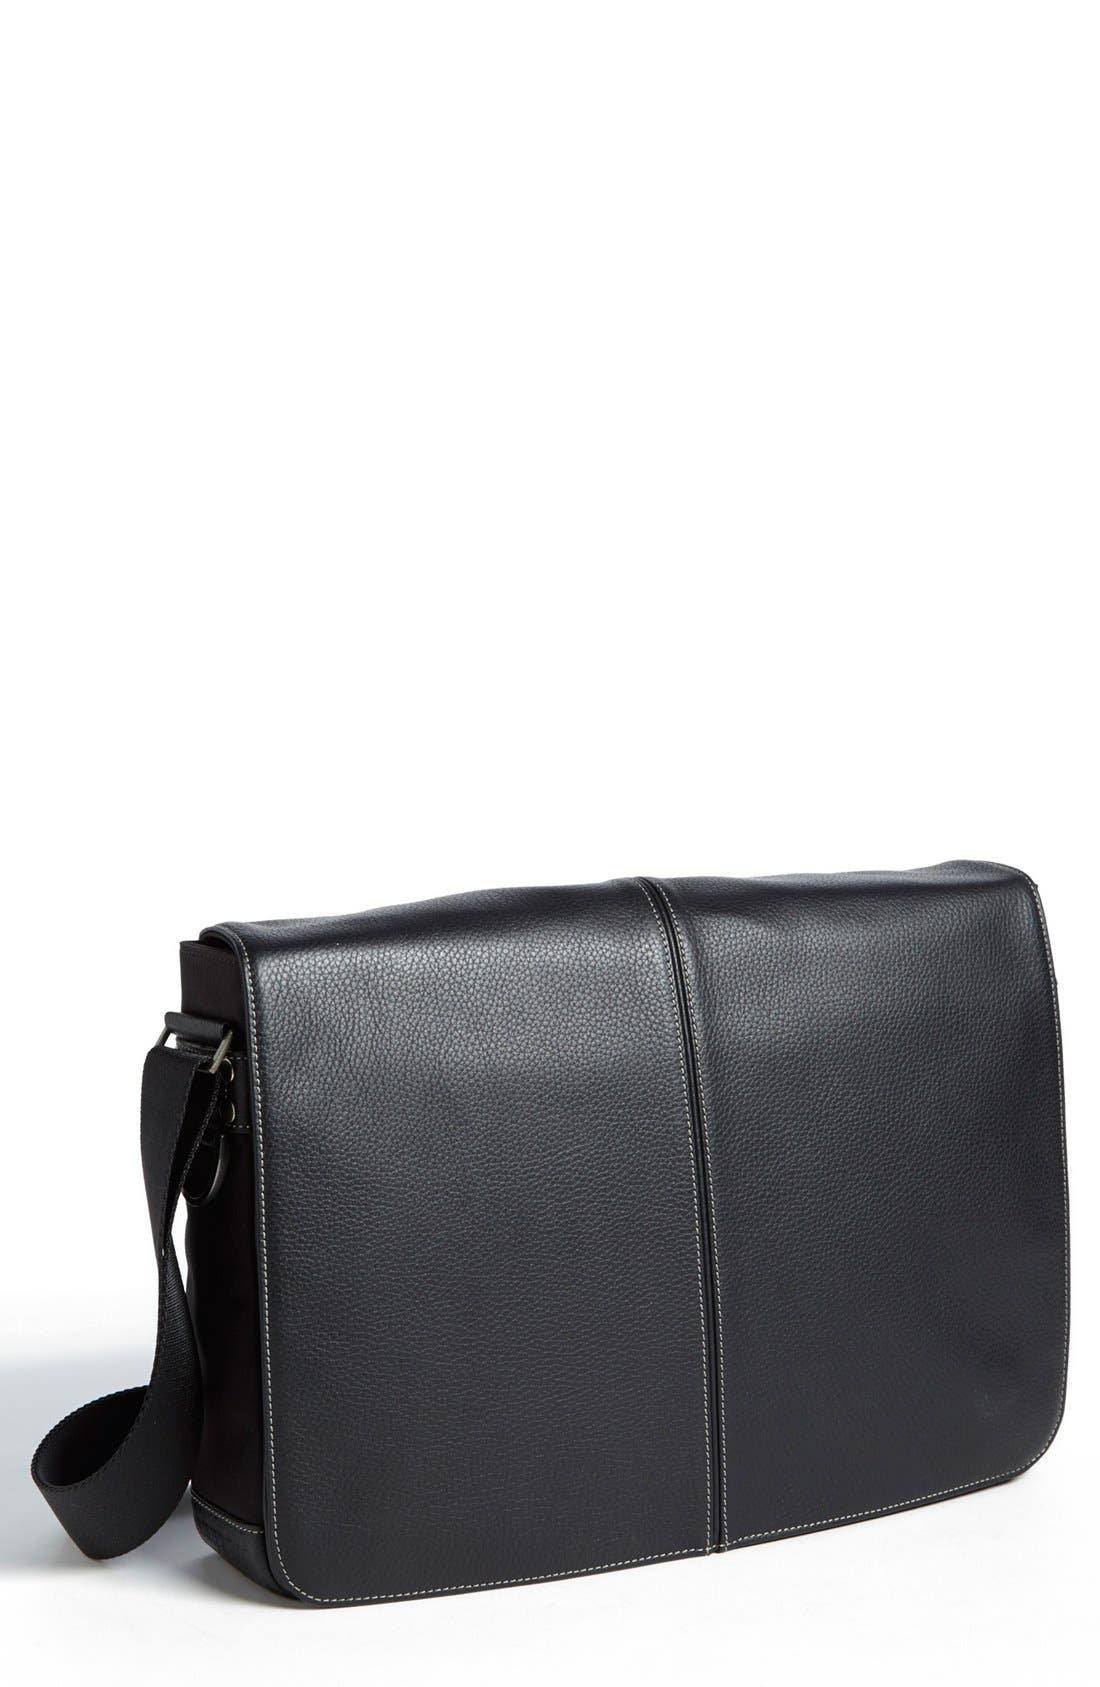 Tyler Slim Leather Laptop Briefcase,                             Main thumbnail 1, color,                             Black/ Khaki